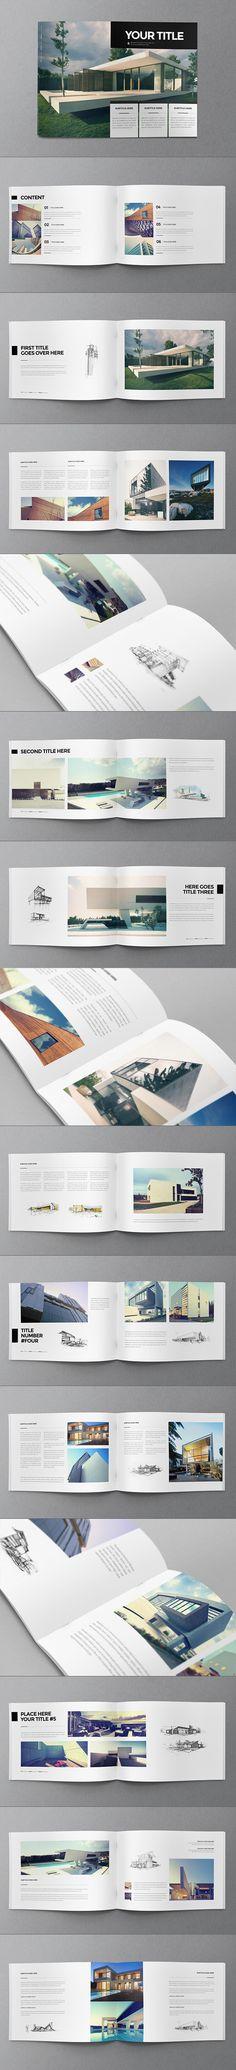 21 best pdf portfolio images in 2016 design portfolio layout page rh pinterest com